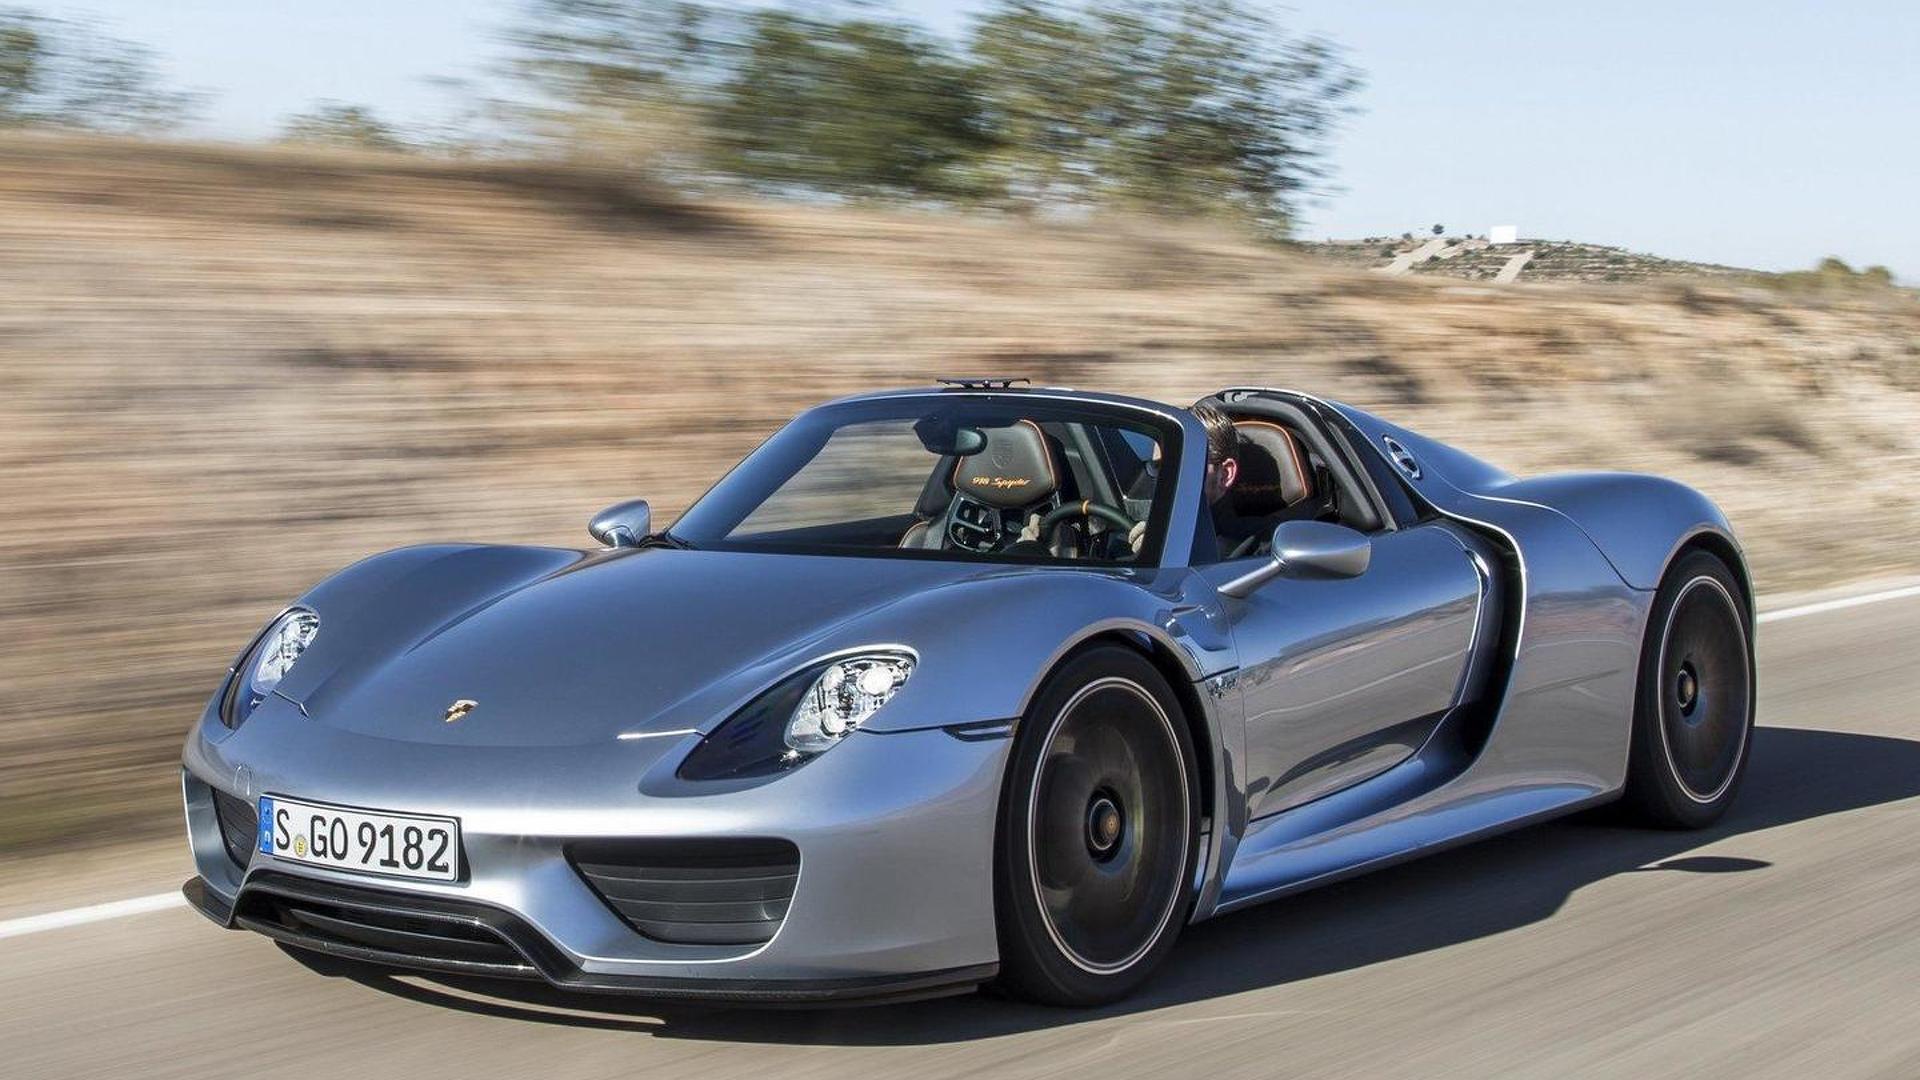 2013-435420-2014-porsche-918-spyder1 Amazing Porsche 918 Spyder sold Out Cars Trend